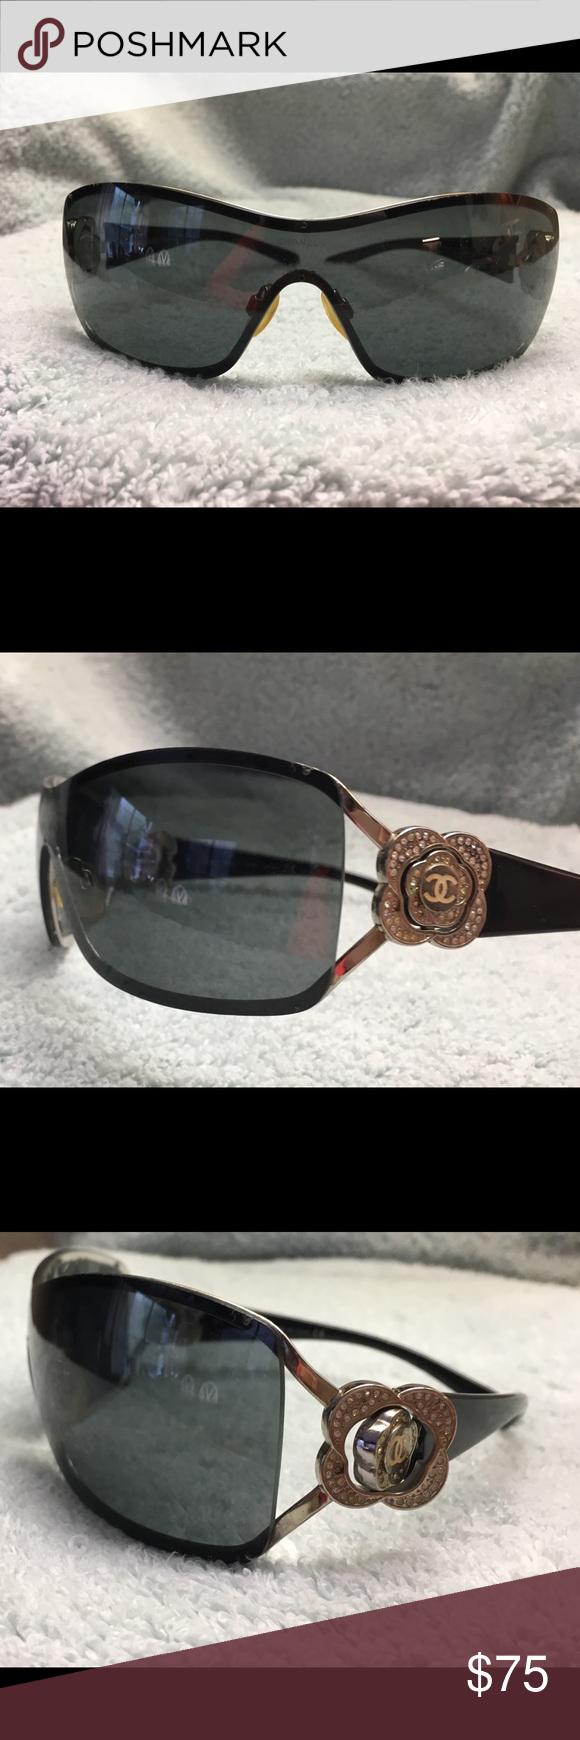 26398fbba579 Chanel Camellia Crystal Shield Sunglasses Chanel Camellia Crystal Shield  Sunglasses. Dark lenses